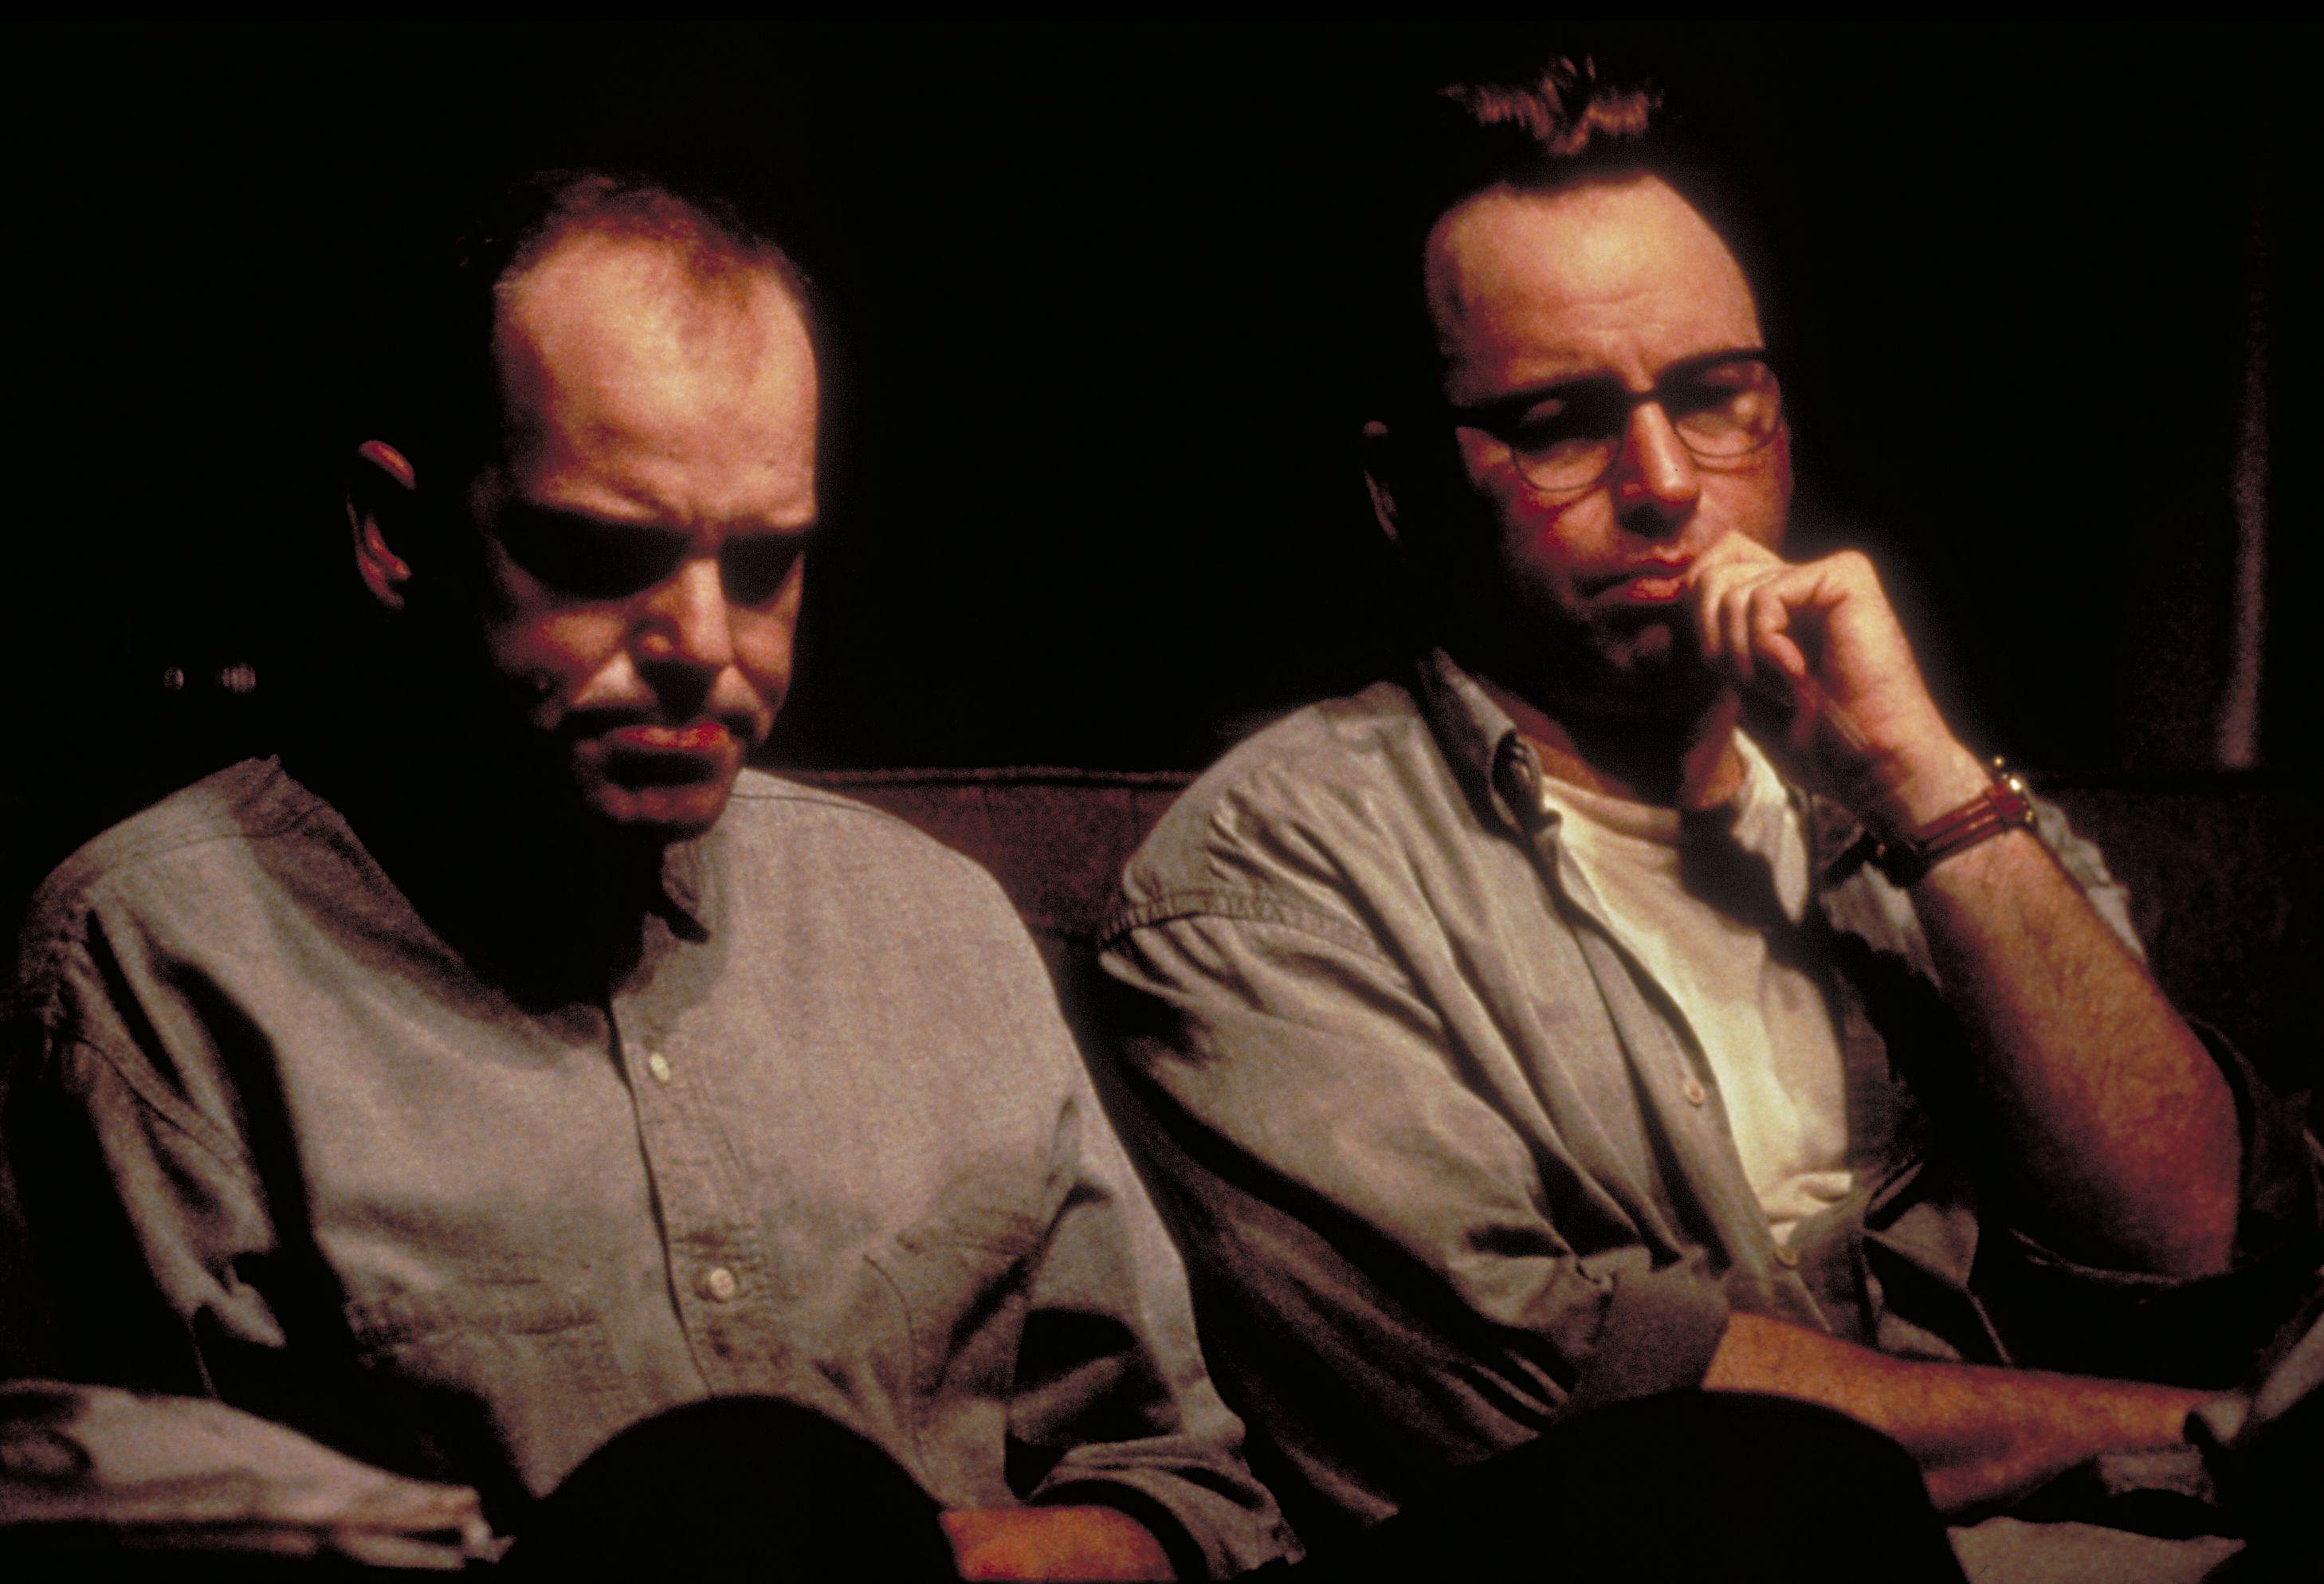 John Ritter and Billy Bob Thornton in Sling Blade (1996)